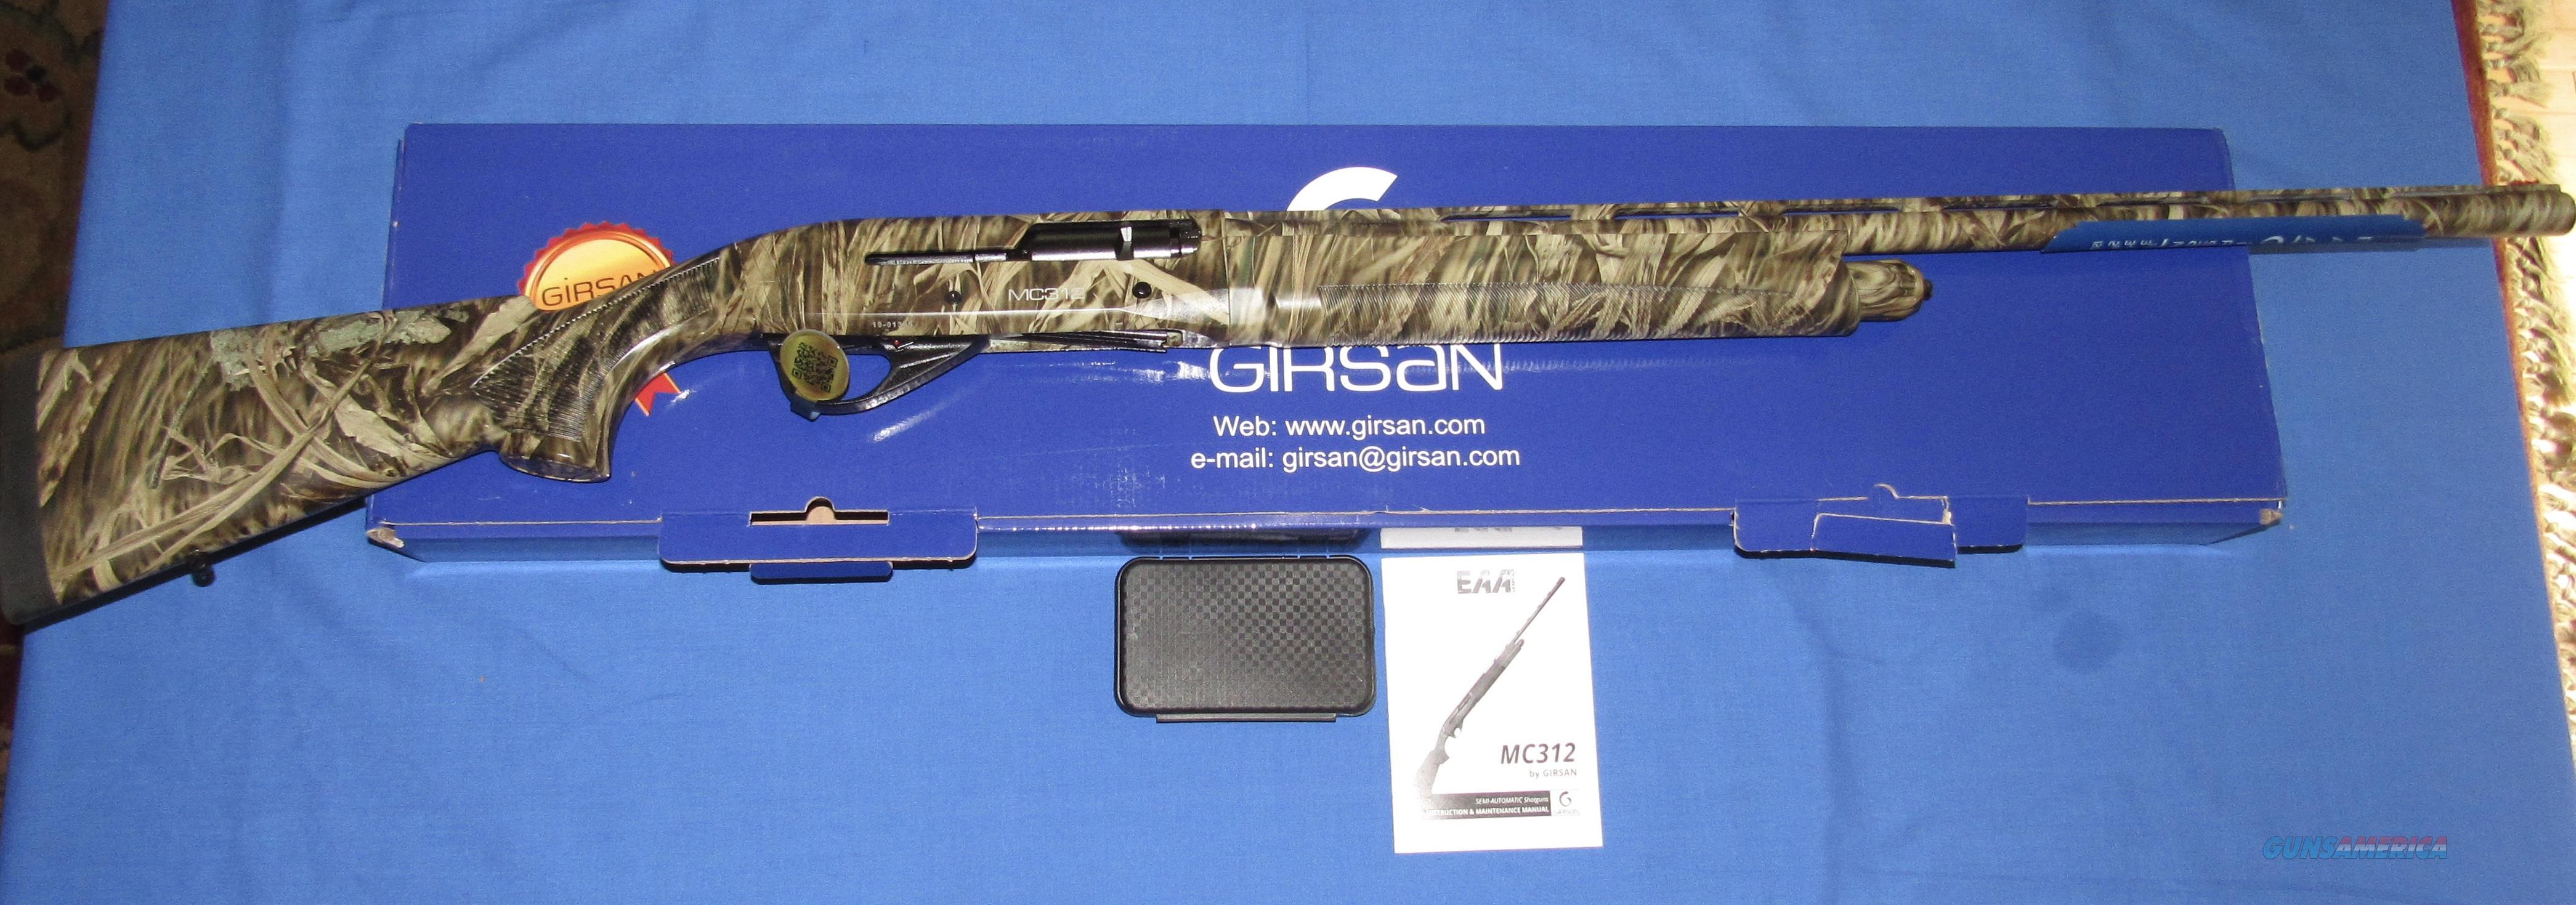 "GIRSAN MC312 INERTIA 12 GAUGE 3.5"" CAMO SEMI-AUTO SHOTGUN FREE SHIPPING!  Guns > Shotguns > EAA Shotguns"